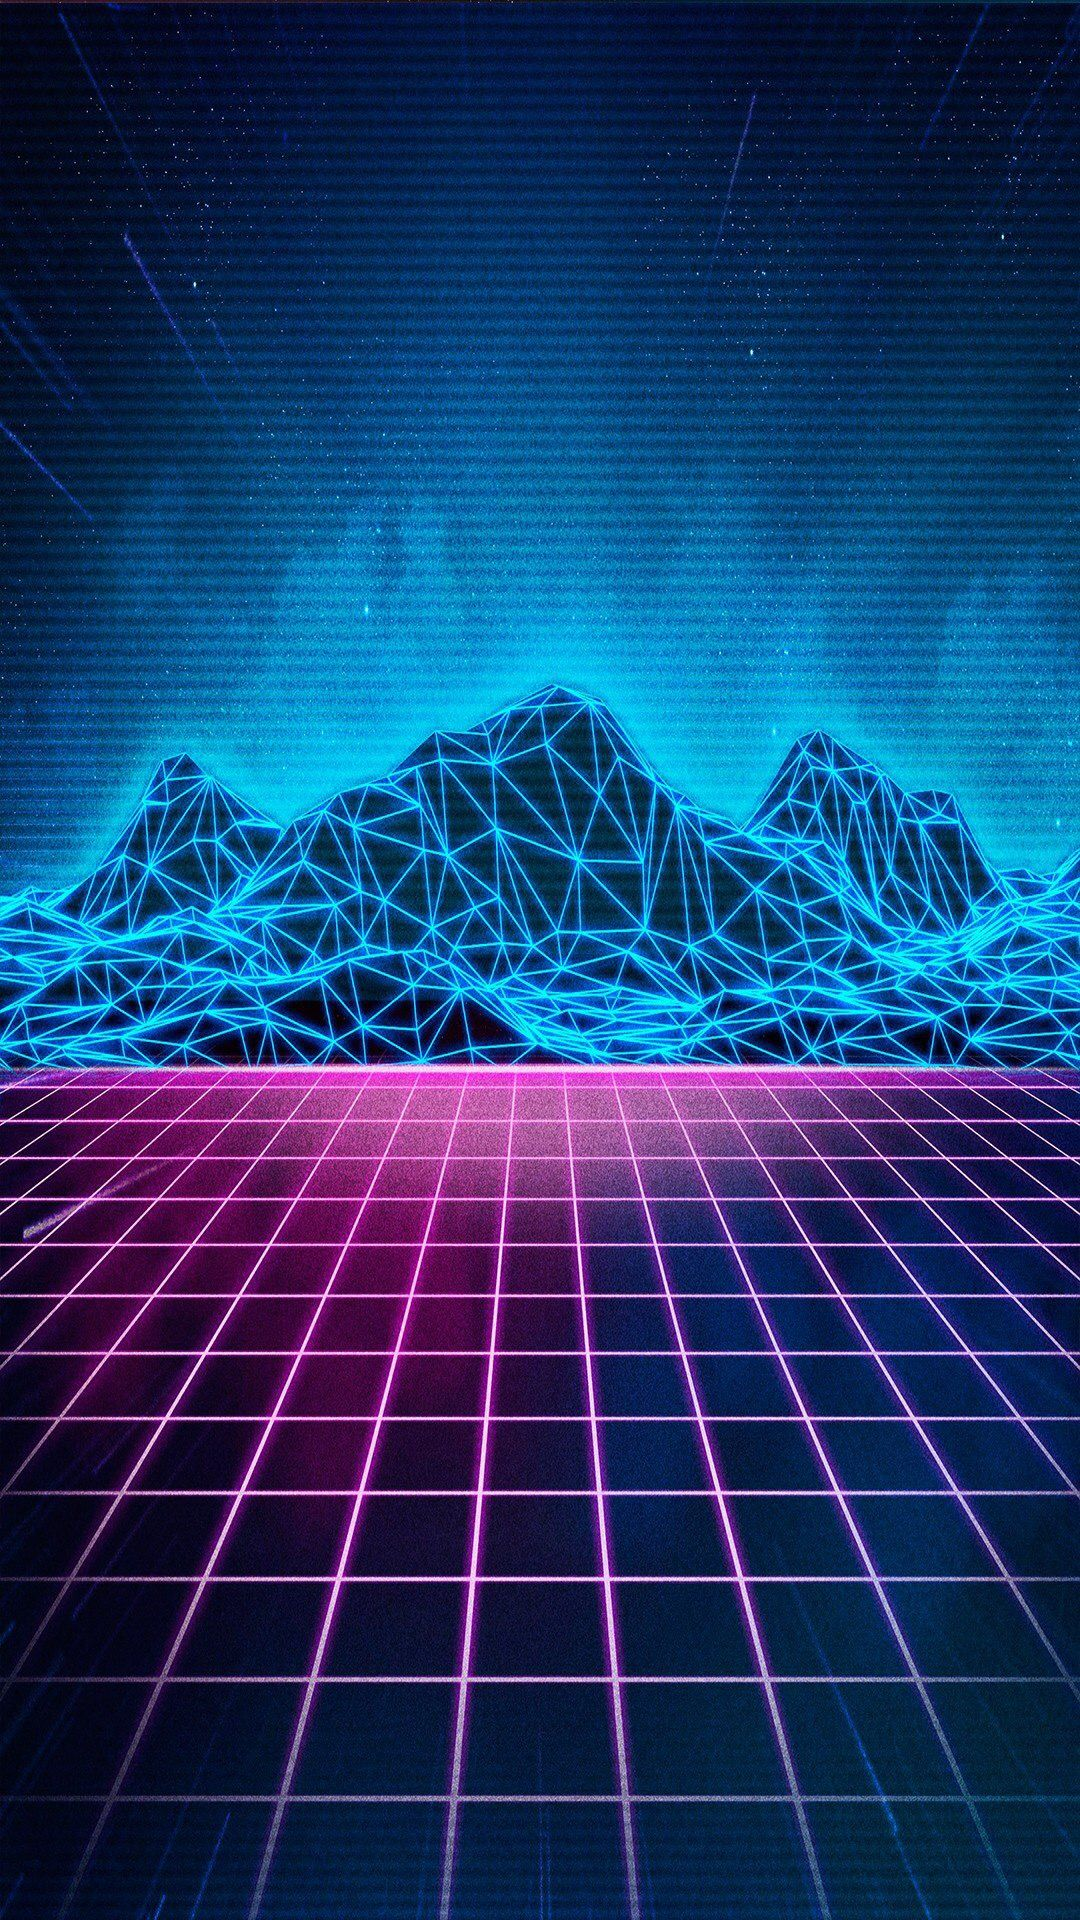 follow: aesthetic magik 👑 | Modern Retro in 2019 | Retro background, Vaporwave wallpaper, Retro ...